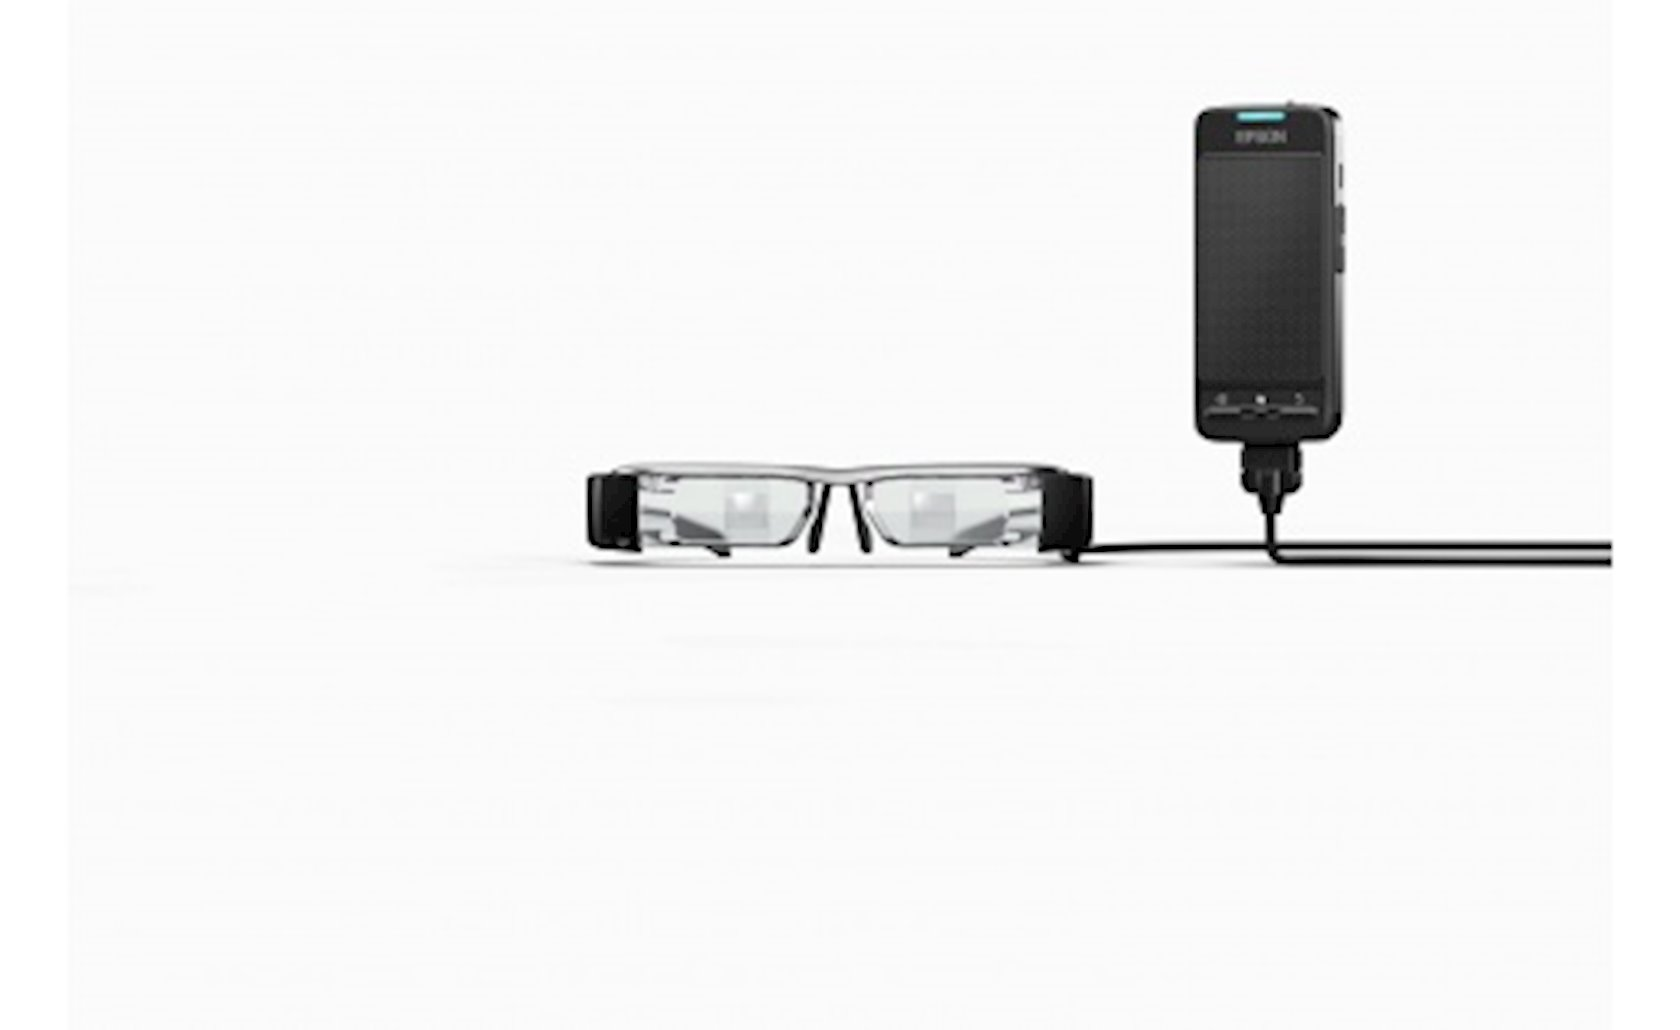 Video eynək EPSON Moverio BT-200